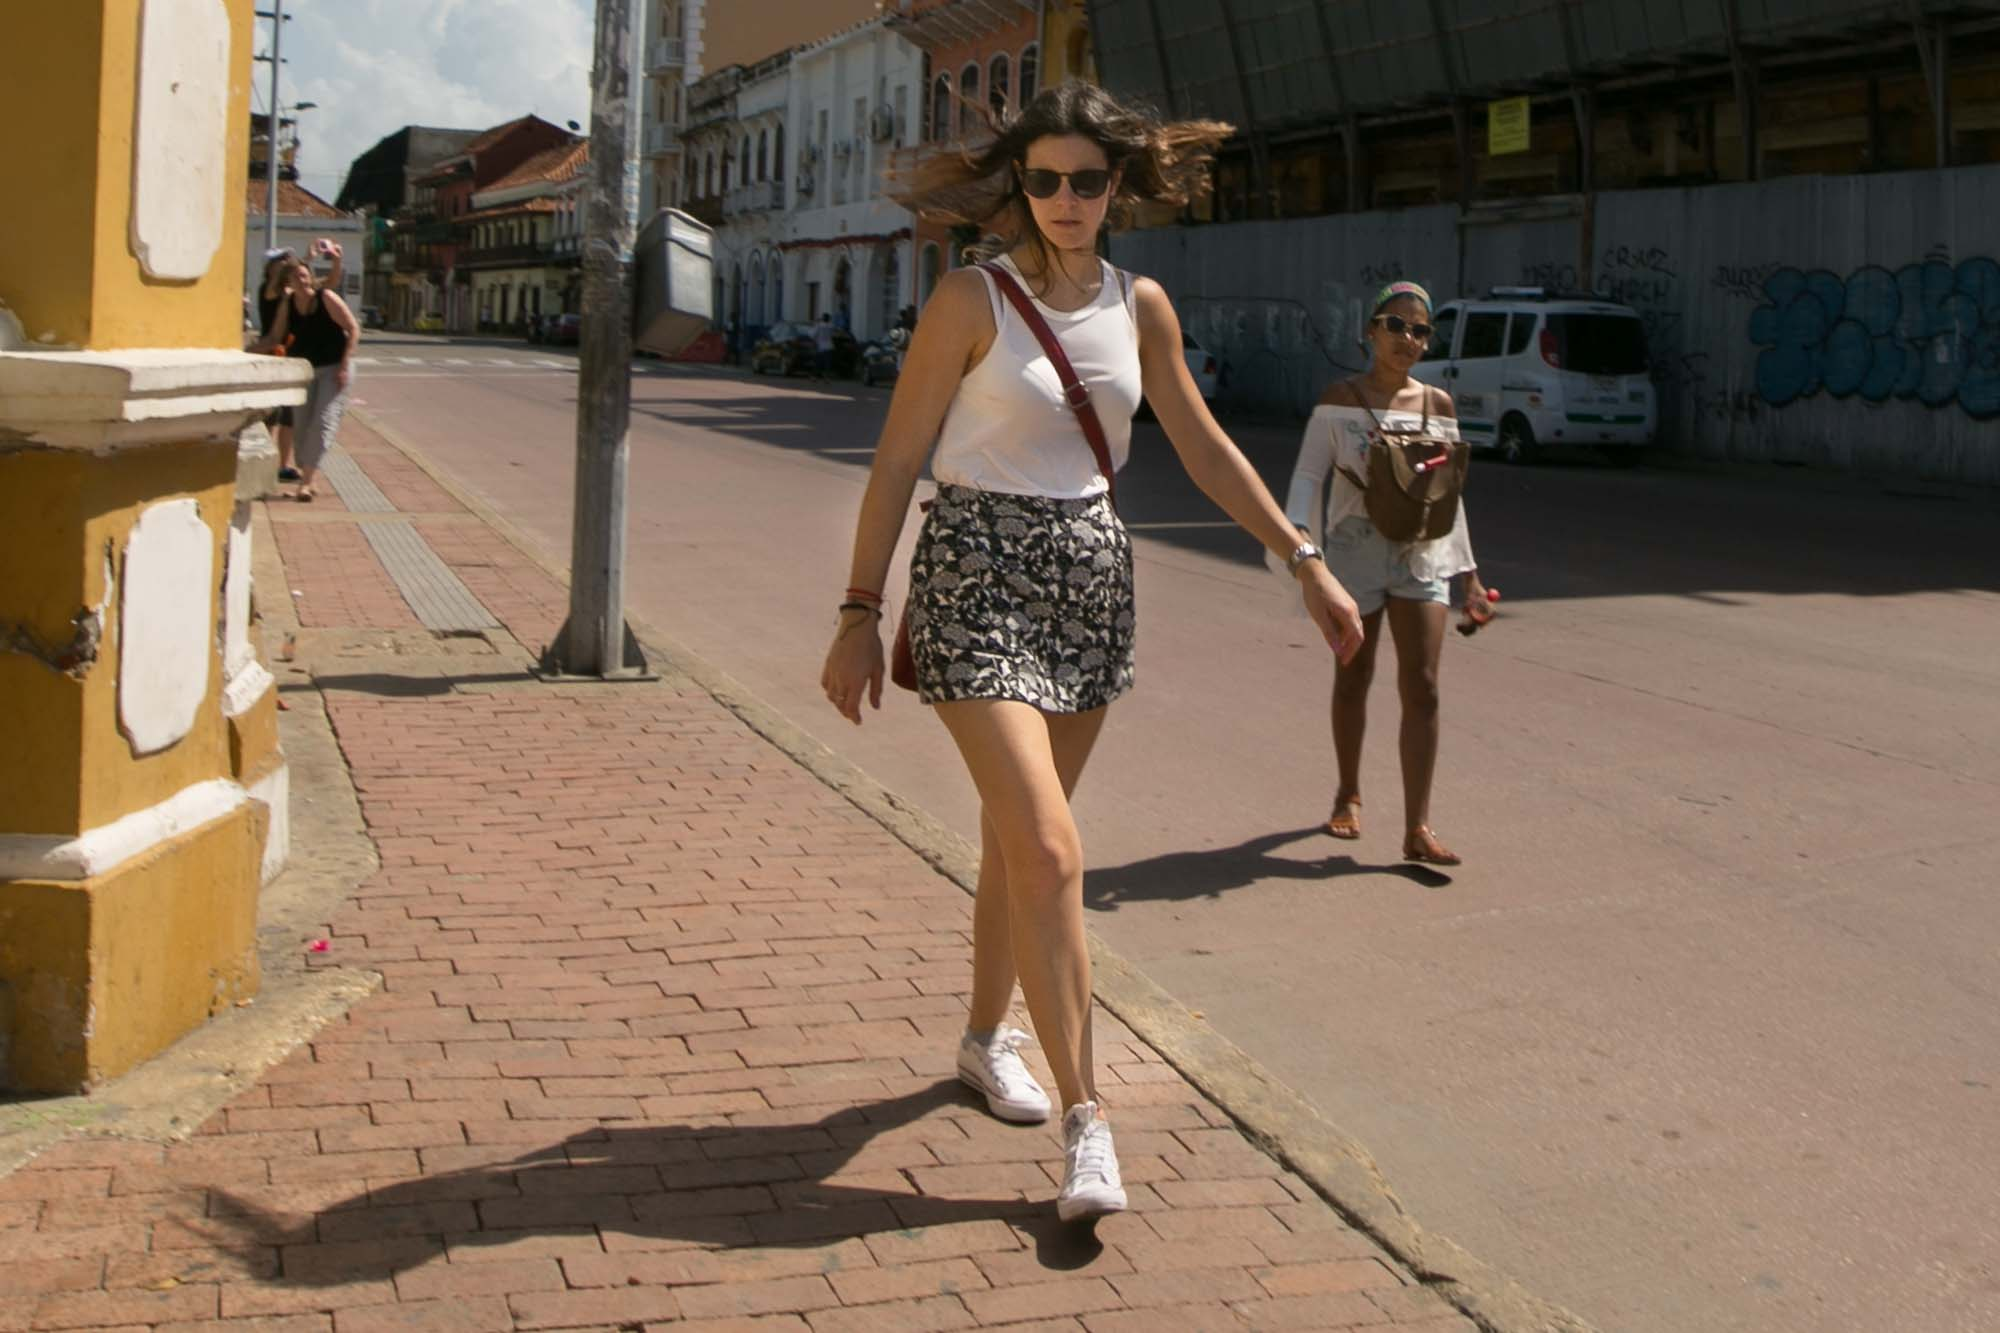 Cartagena locals